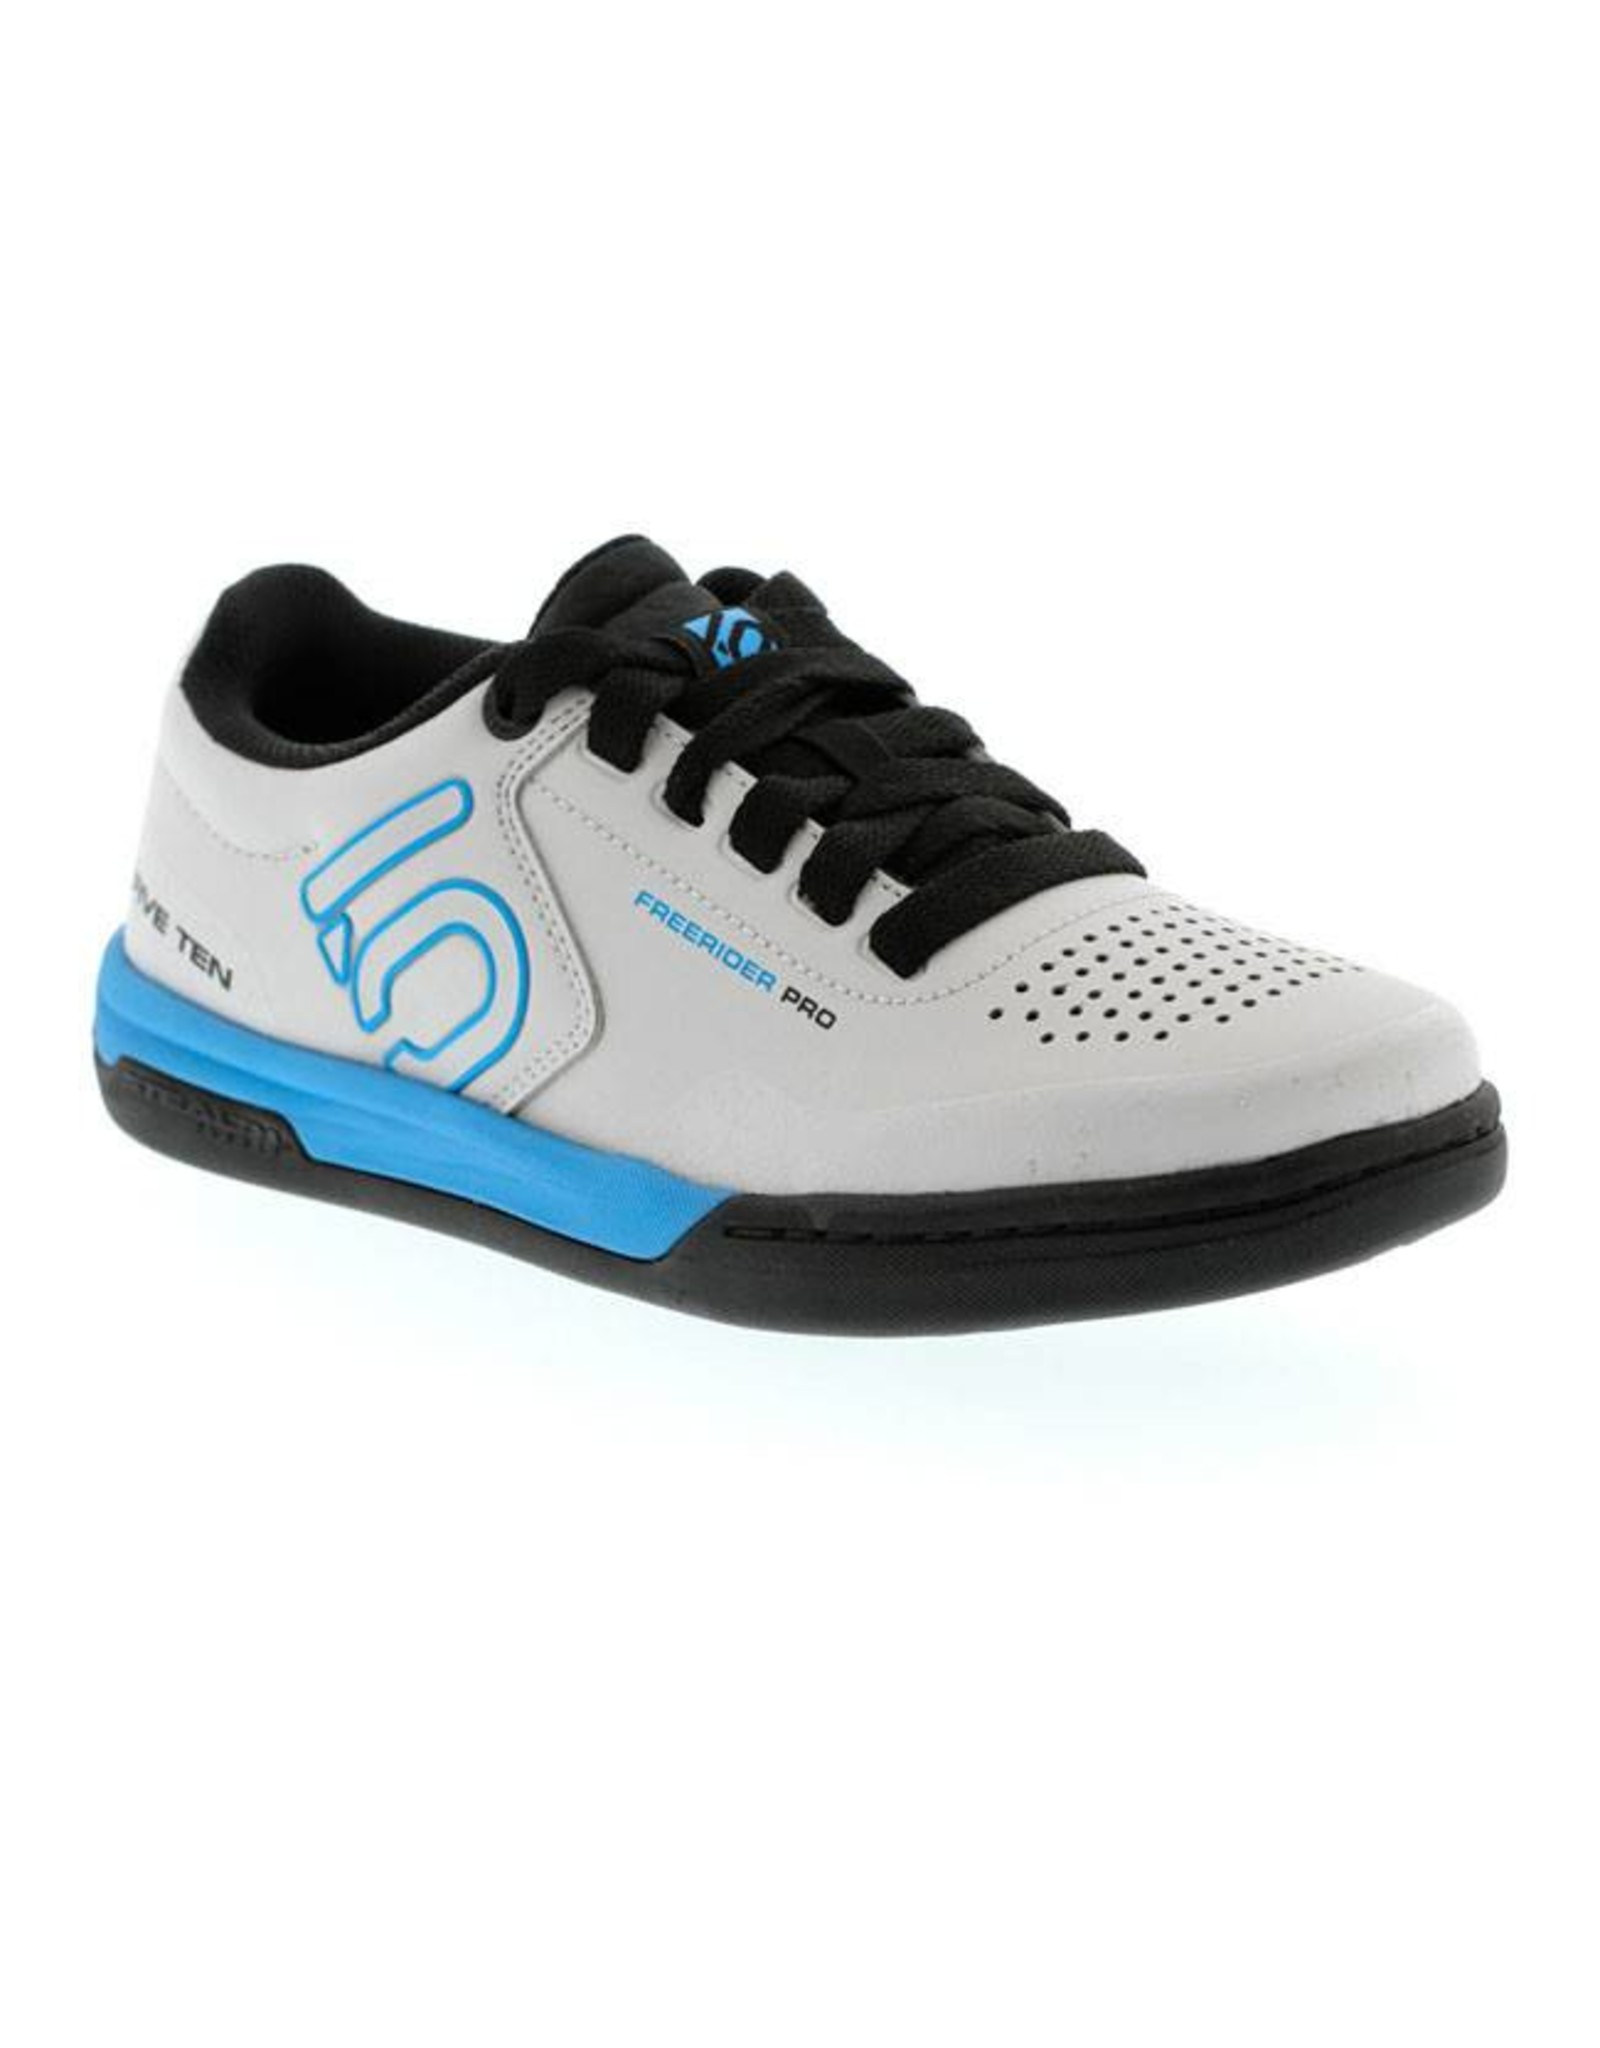 Five Ten Five Ten Freerider Pro Women's Flat Pedal Shoe: Solid Gray 10.5